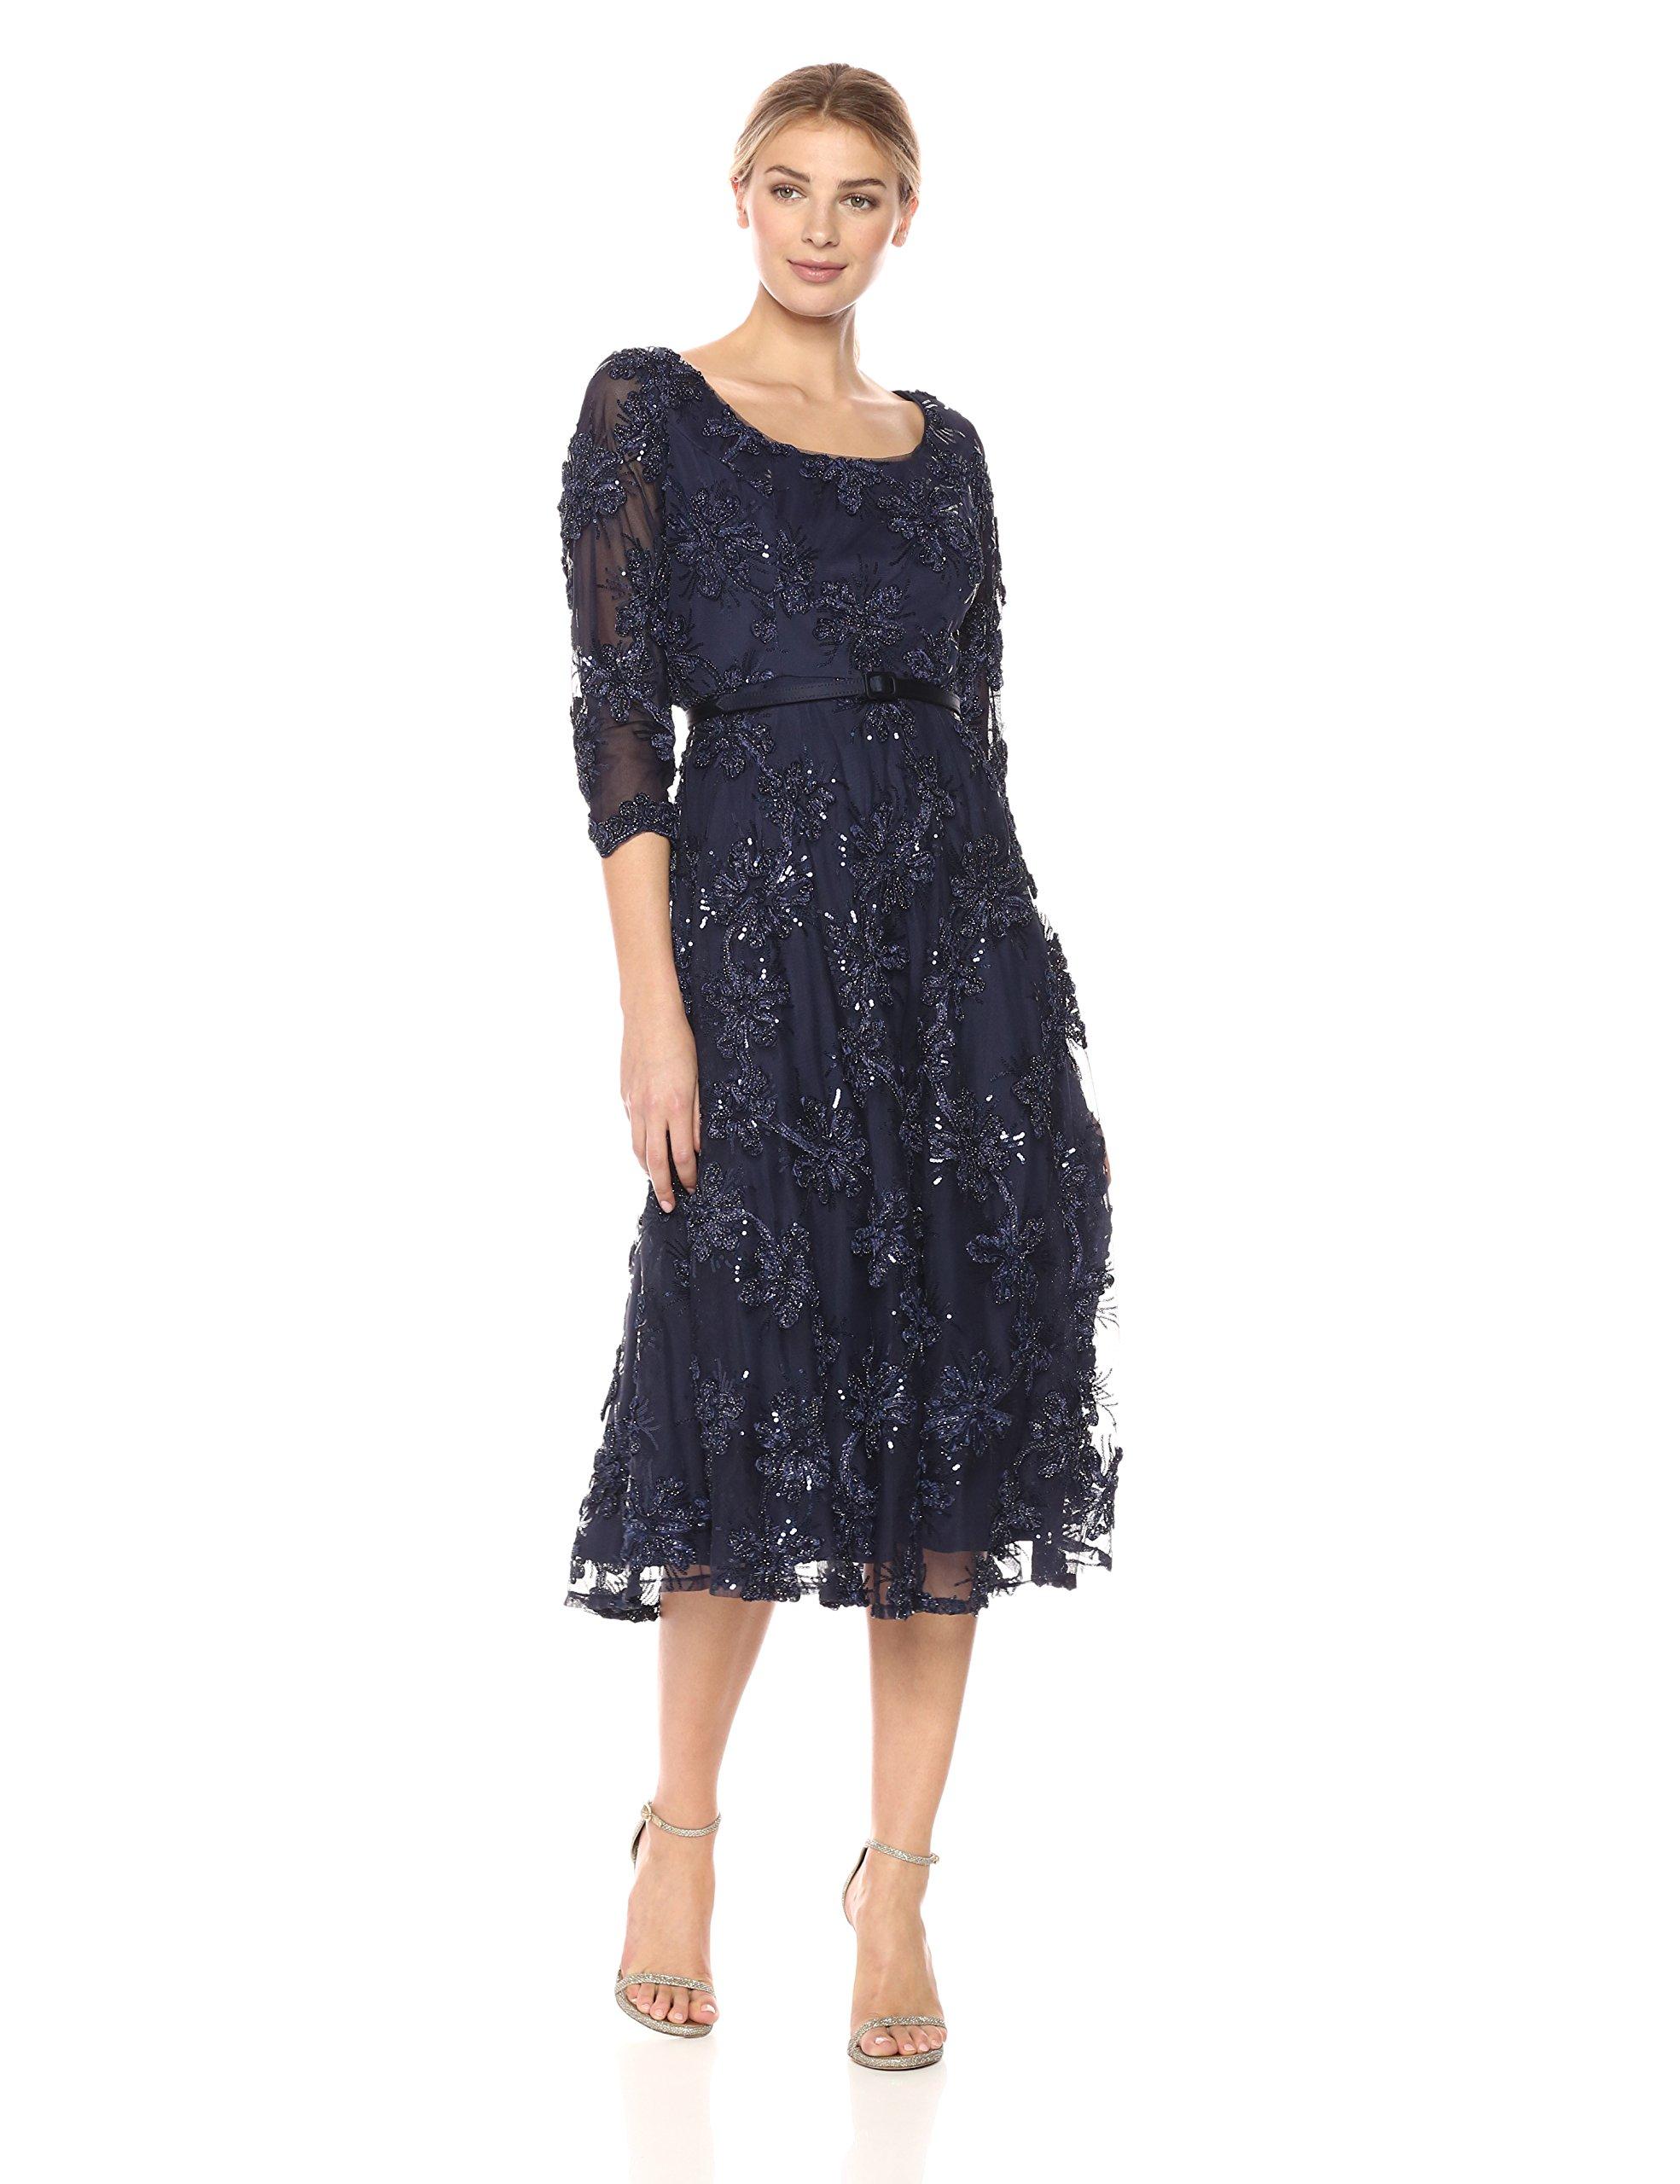 Alex Evenings Women's Tea Length Soutache Dress With Satin Belt (Petite and Regular Sizes), Navy, 14 by Alex Evenings (Image #1)